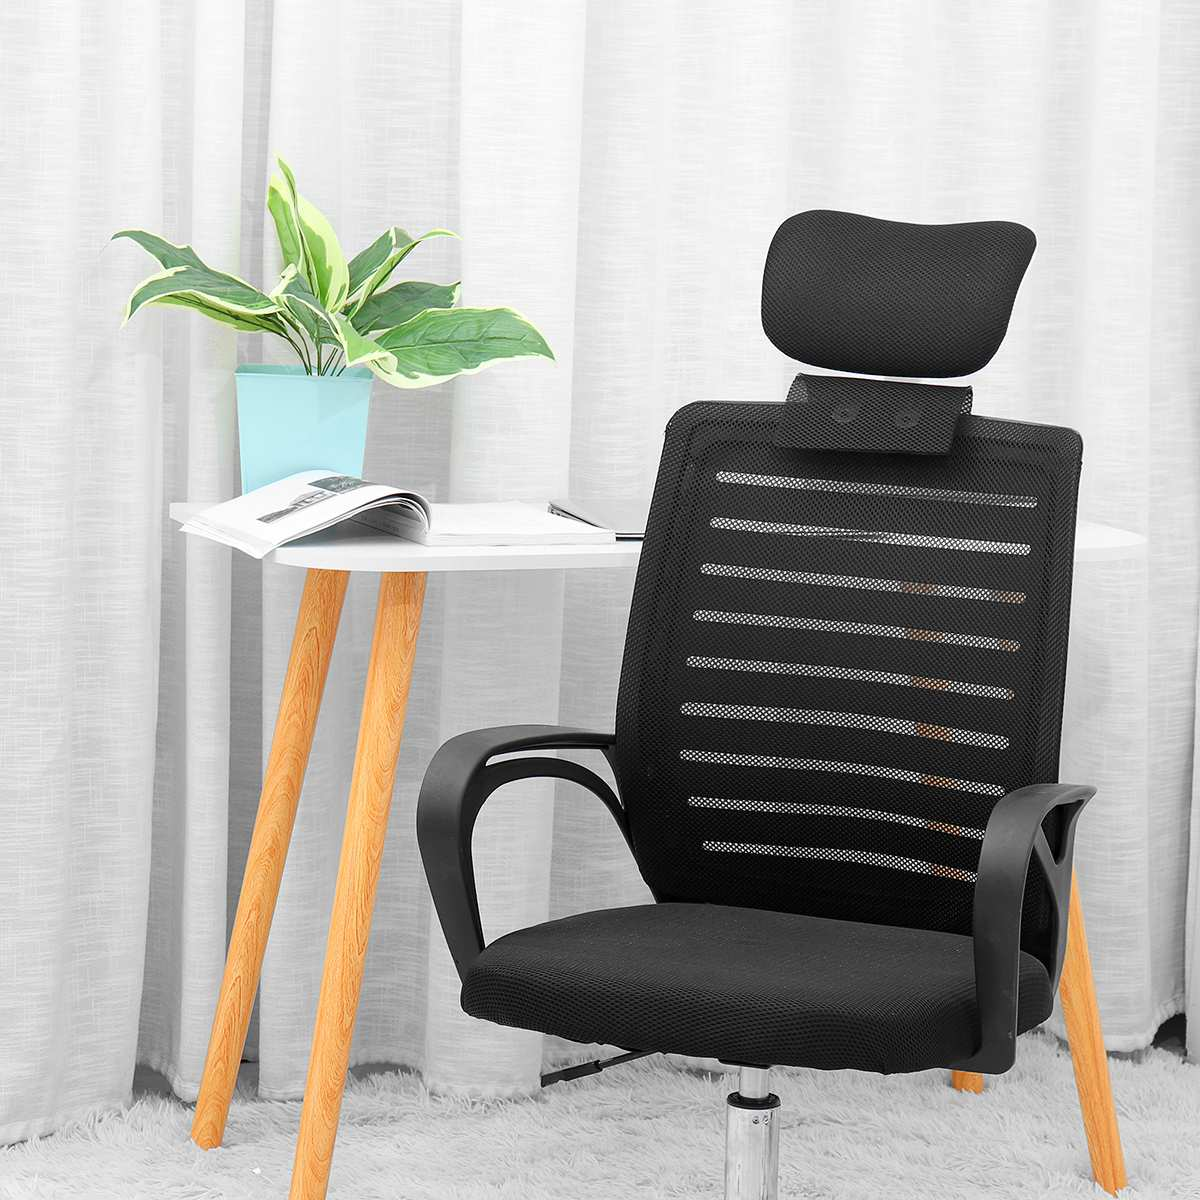 Chair Headrest Pillow Adjustable Headrest Office Chair Computer Chair Neck Protection Pillow Headrest for Chair Office Frames